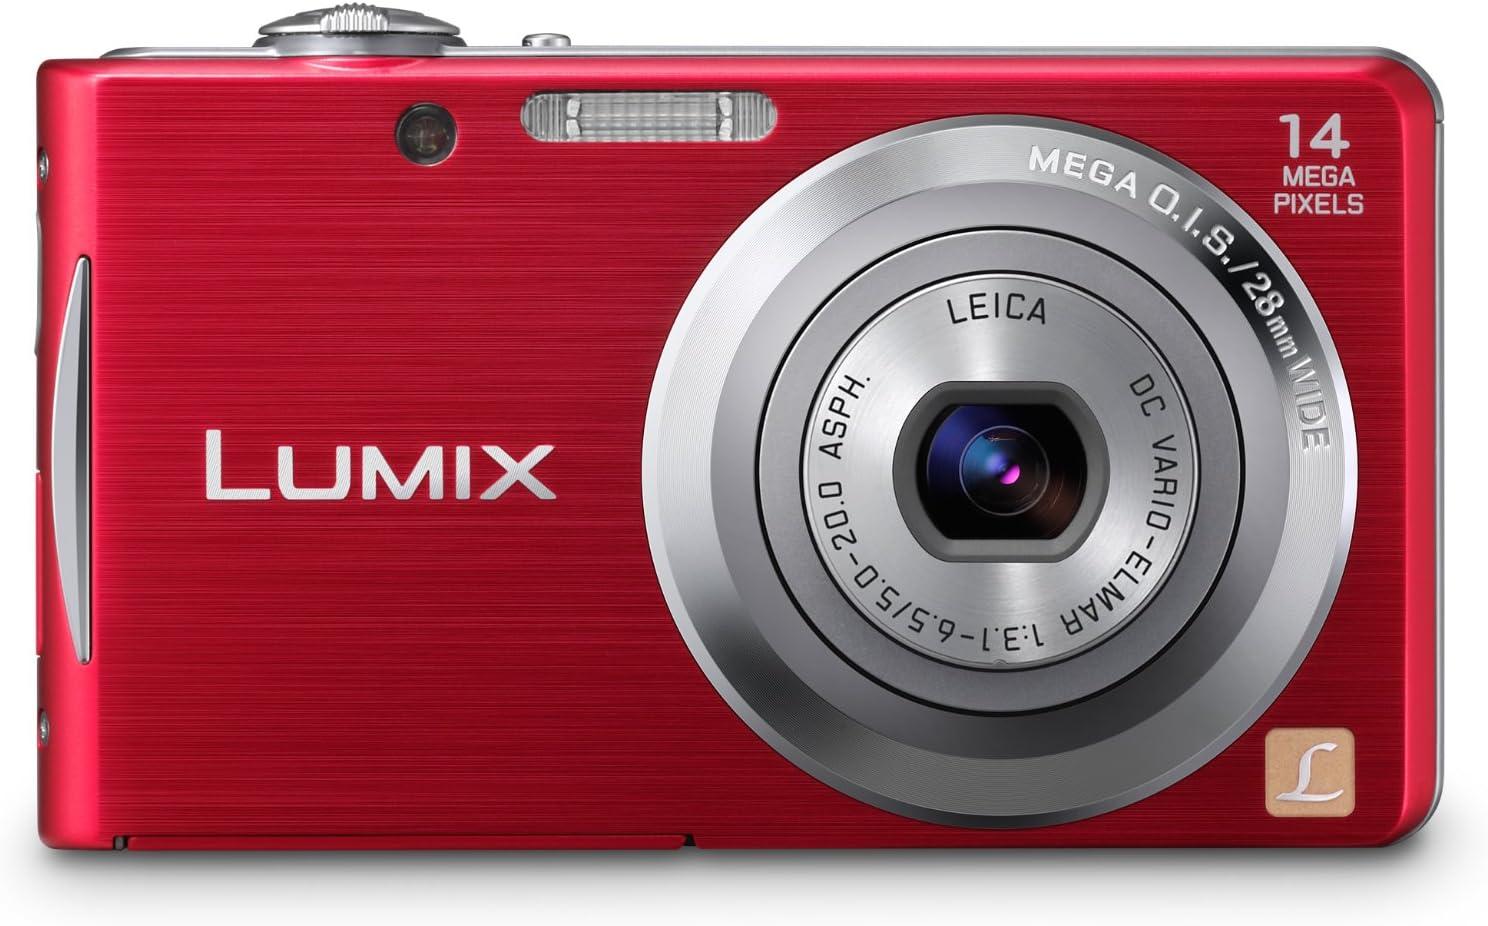 Panasonic Lumix DMC-FH2 14.1 MP Digital Camera 4x Time sale with New sales Optical I